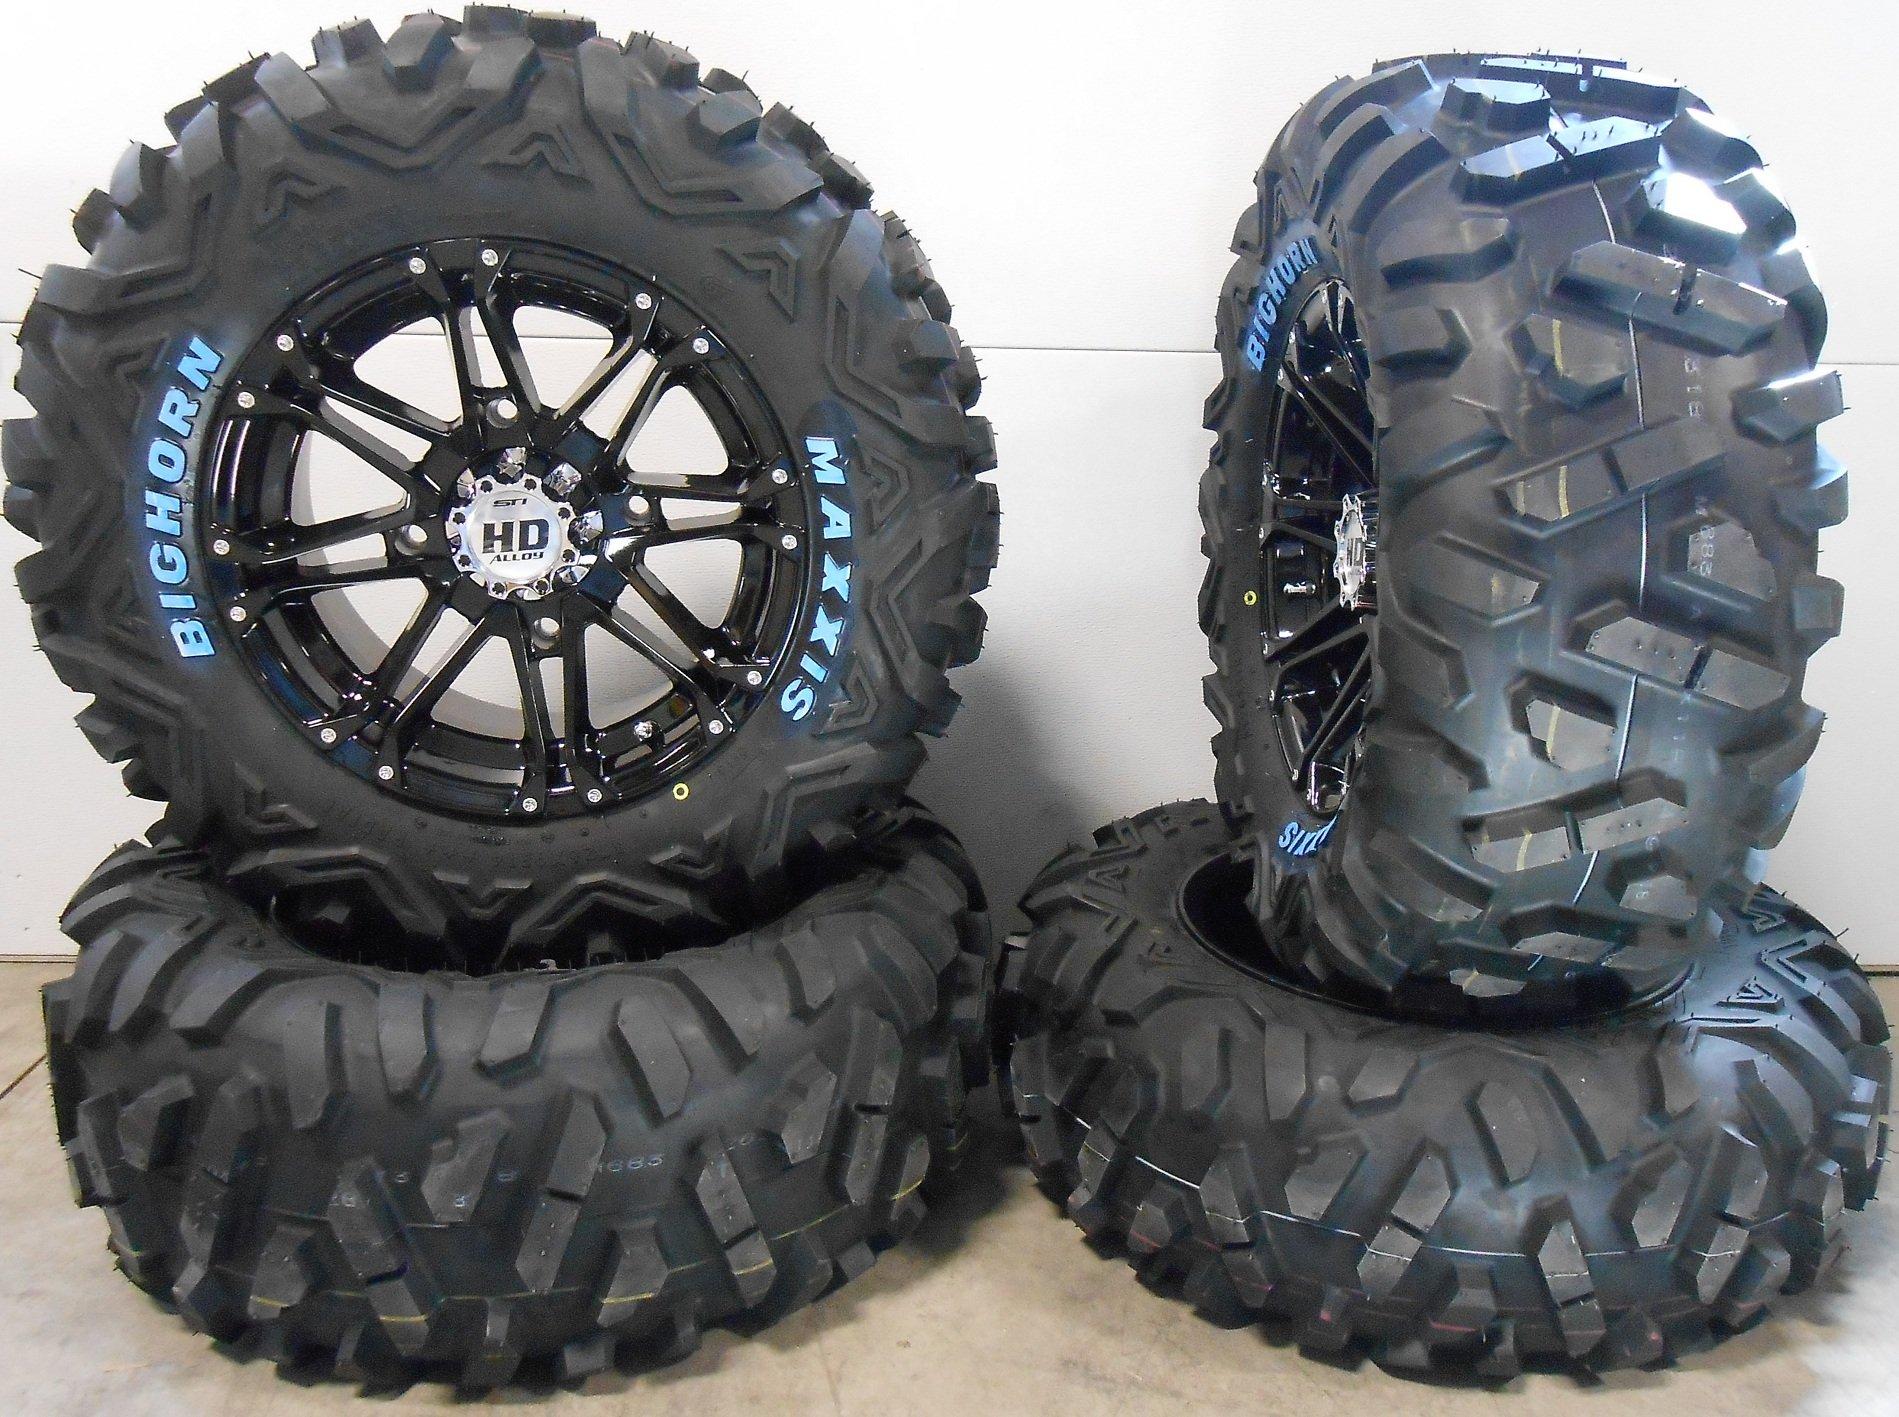 Bundle - 9 Items: STI HD3 14'' Wheels Black 26'' BigHorn Tires [4x156 Bolt Pattern 3/8x24 Lug Kit]